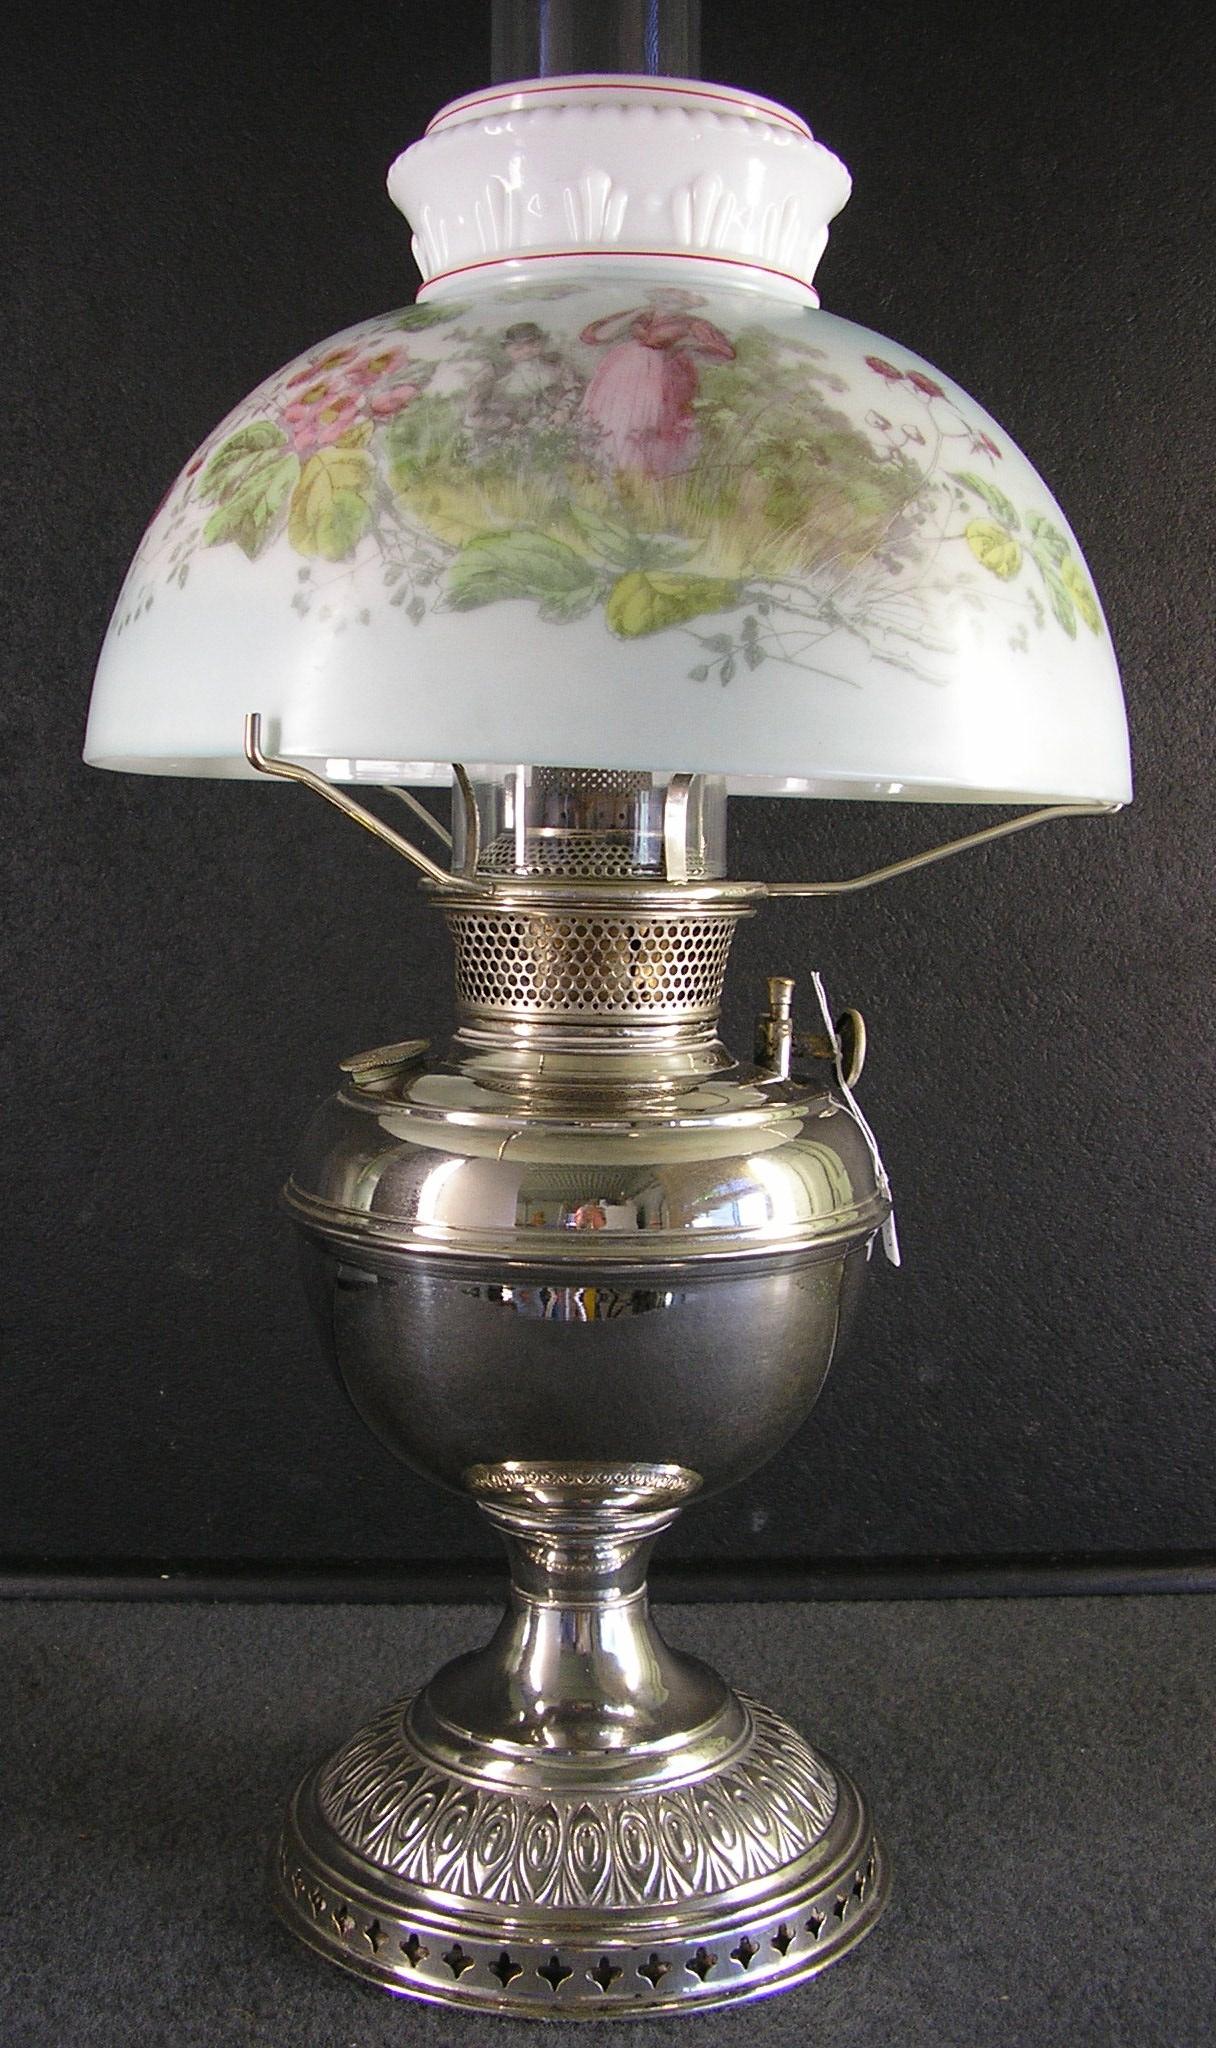 antique kerosene lamps 10 fine sources of light as an. Black Bedroom Furniture Sets. Home Design Ideas